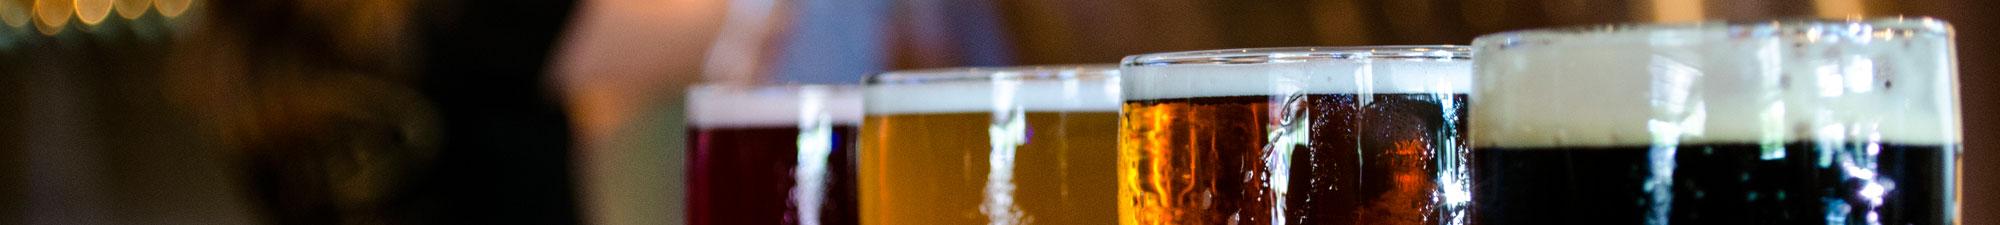 baton rouge craft beers